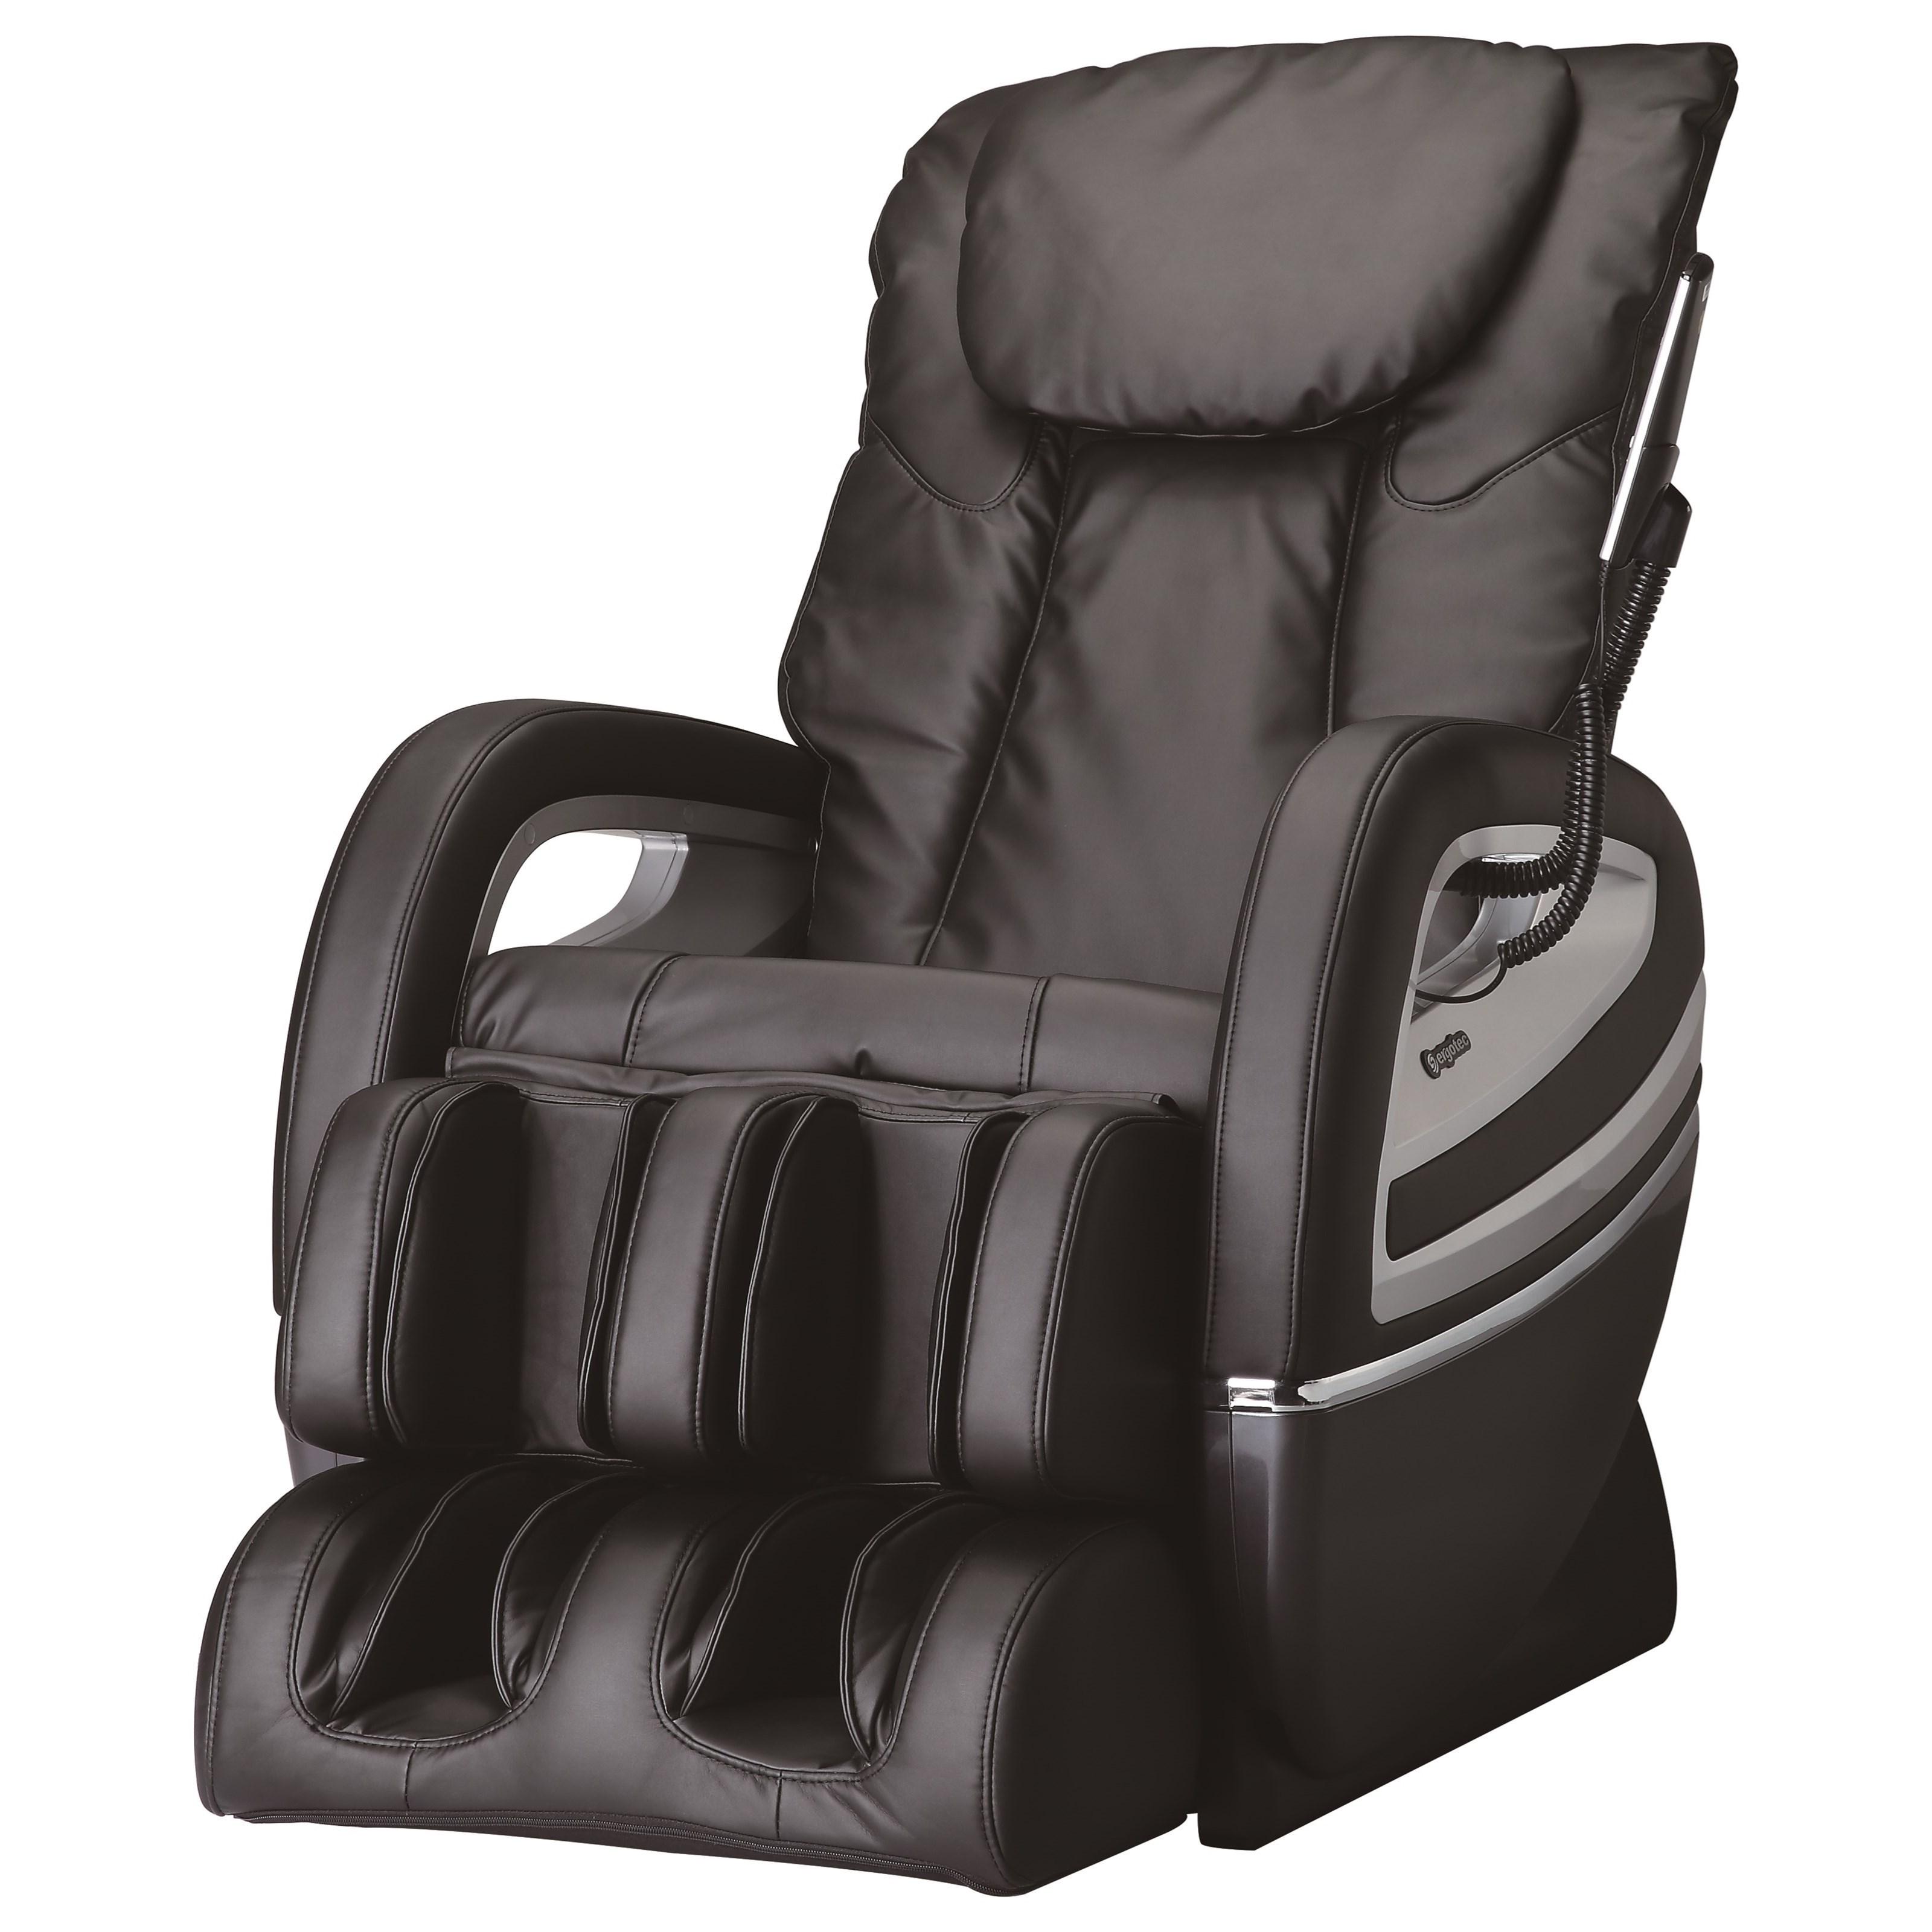 Cozzia EC Reclining Massage Chair